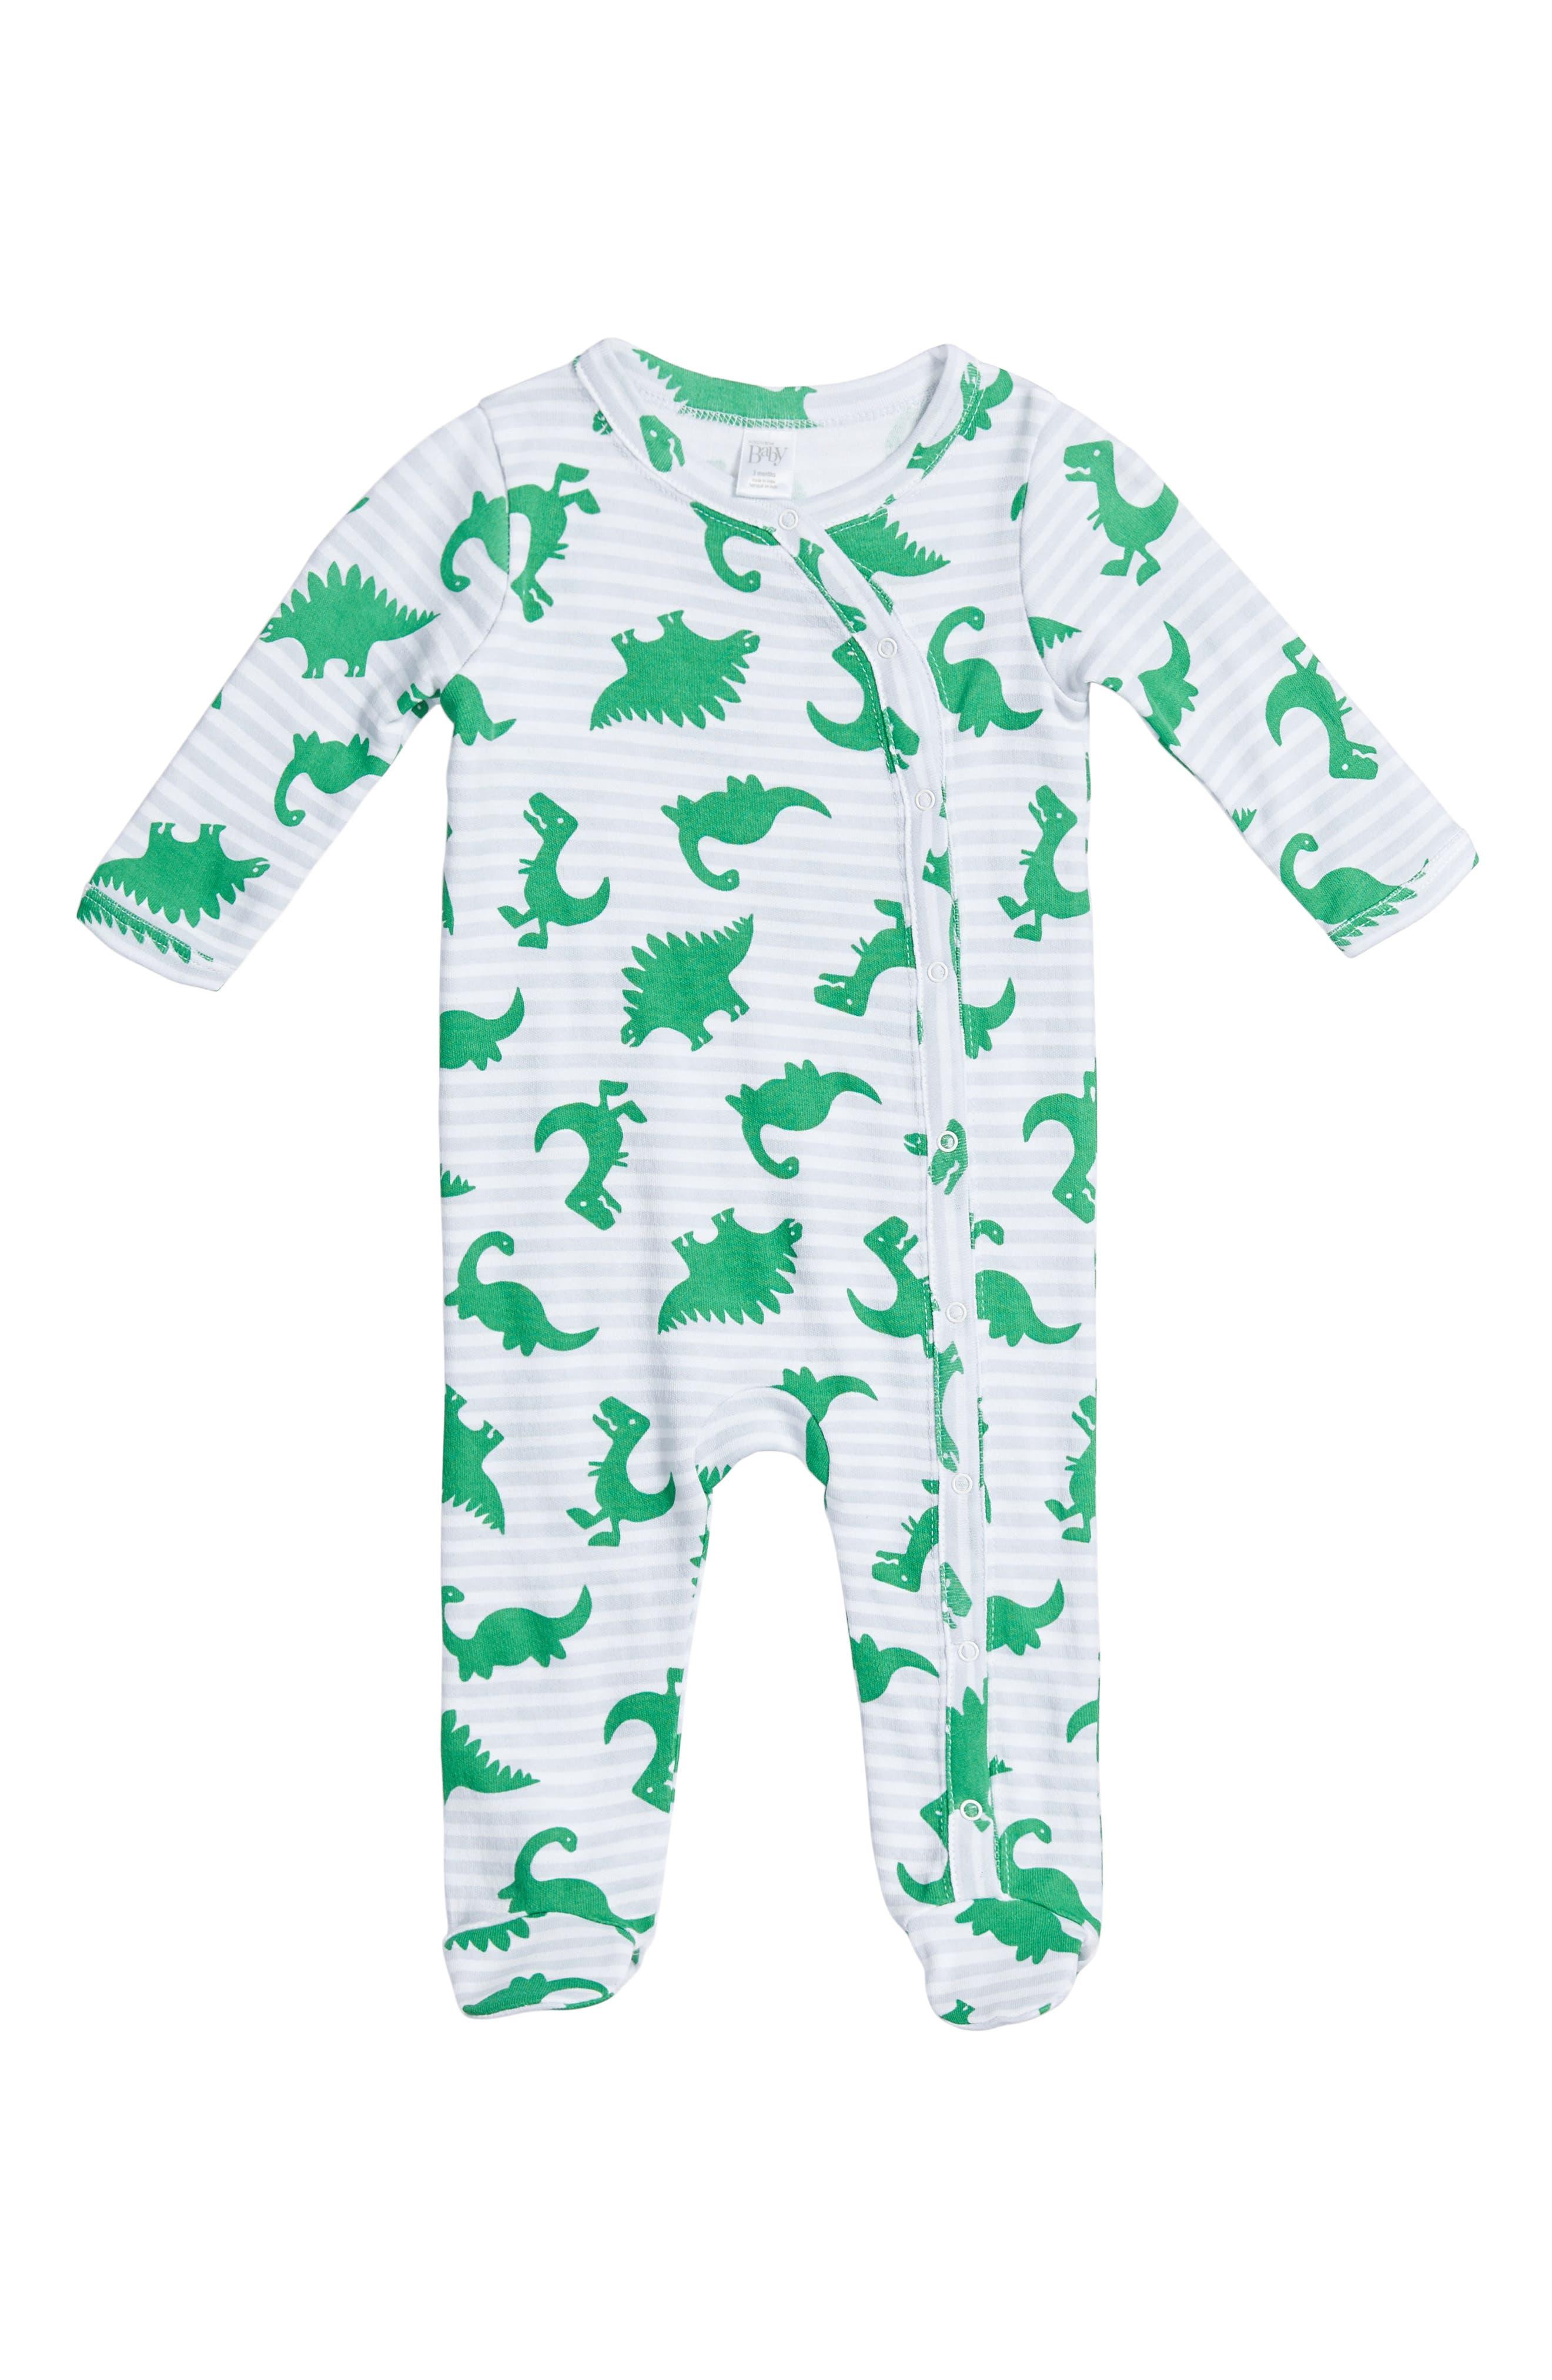 Main Image - Nordstrom Baby Print Footie (Baby)